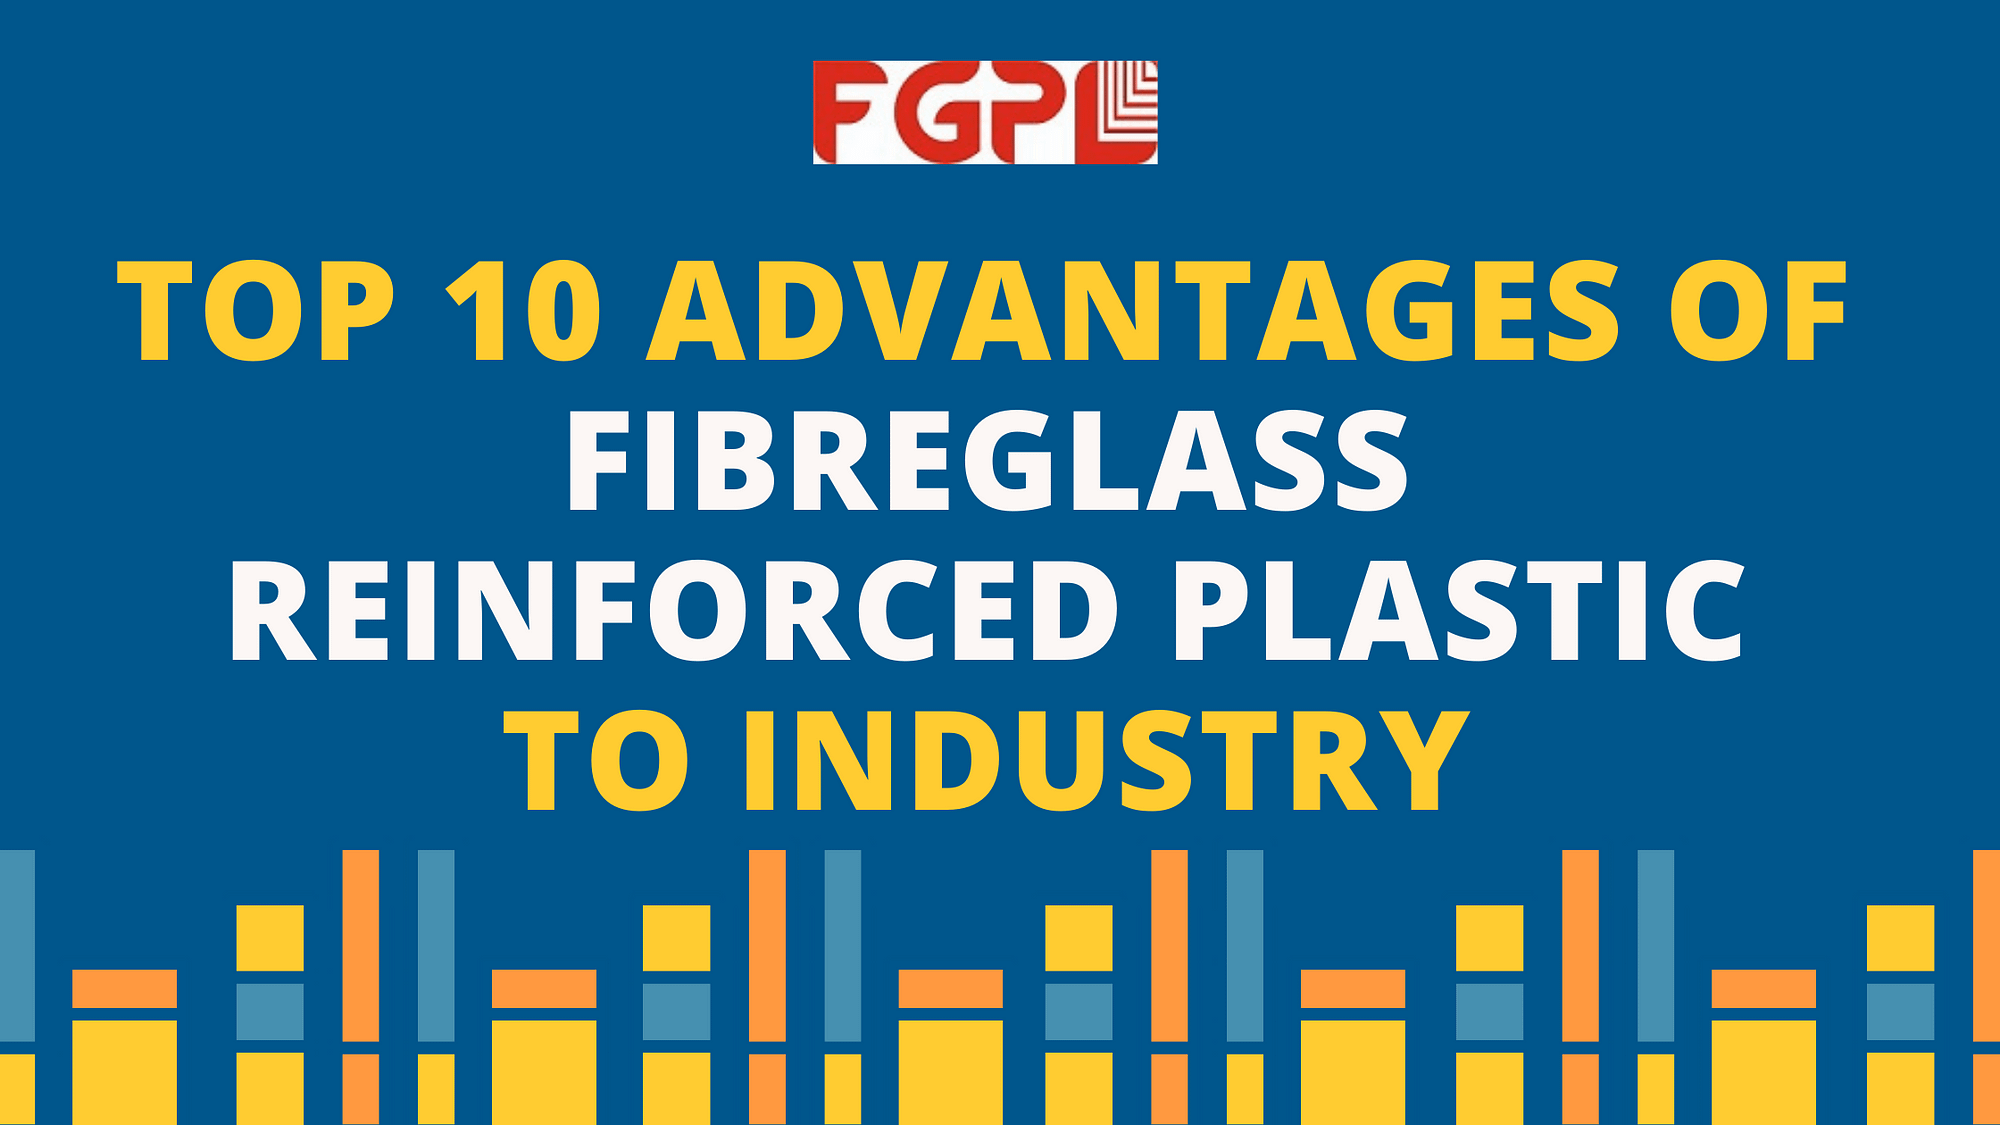 Advantages of Fibreglass Reinforced Plastics